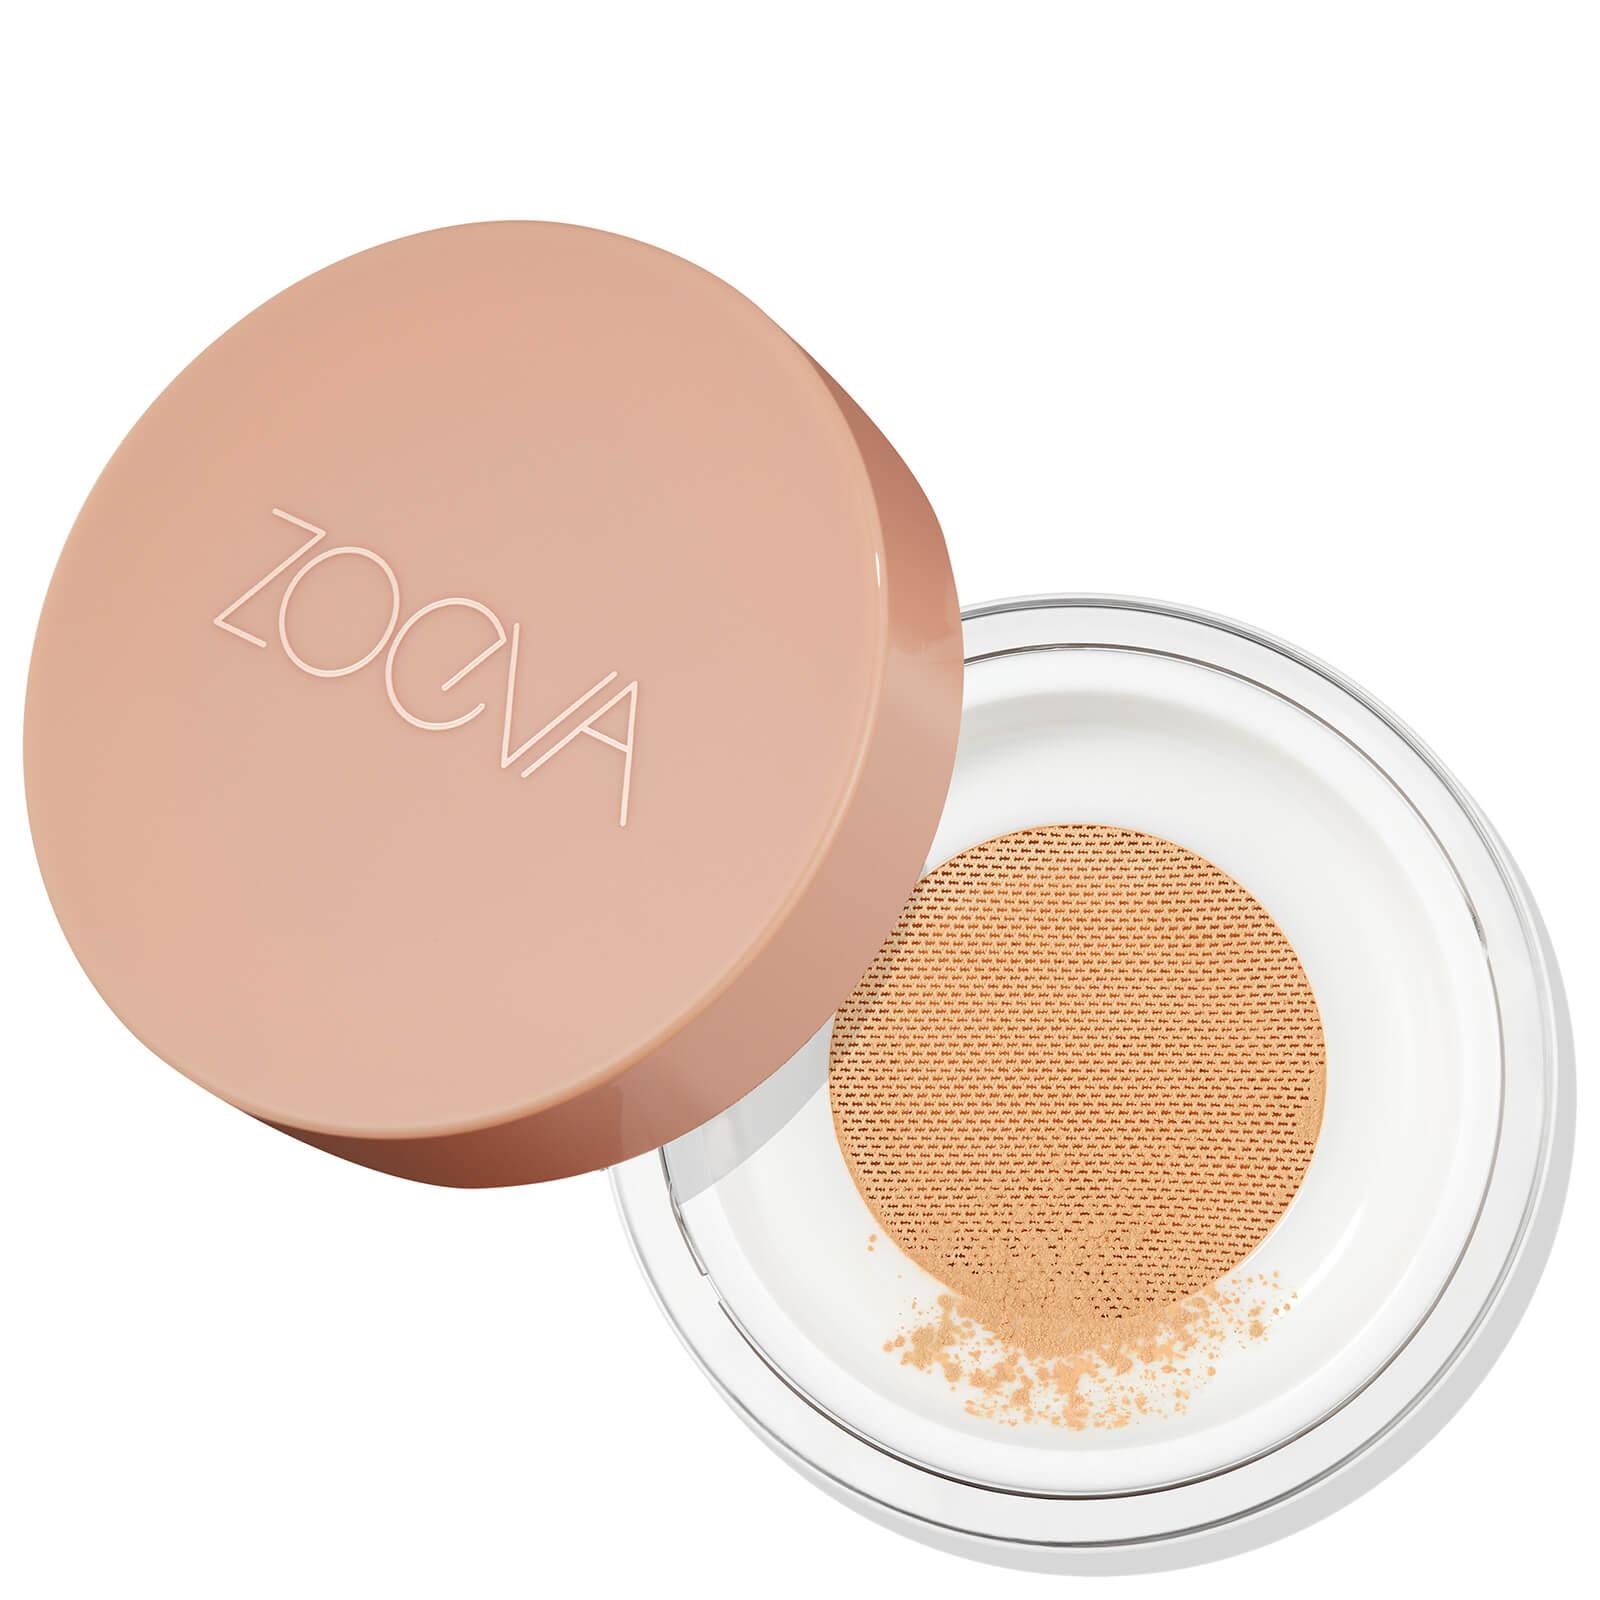 Купить ZOEVA Authentik Skin Finishing Powder 14g (Various Shades) - Remarkable